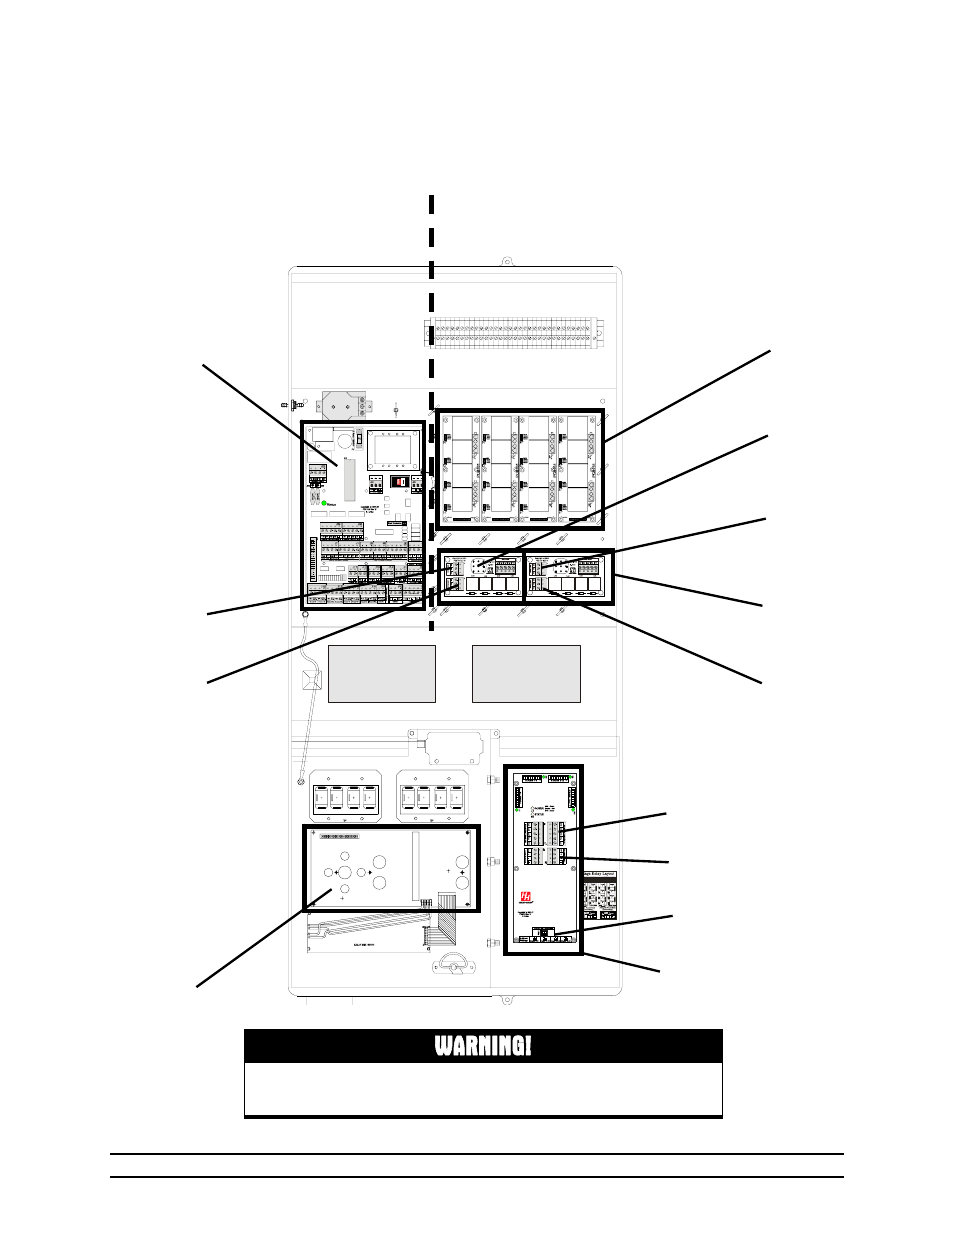 Ul 924 Relay Wiring Diagram